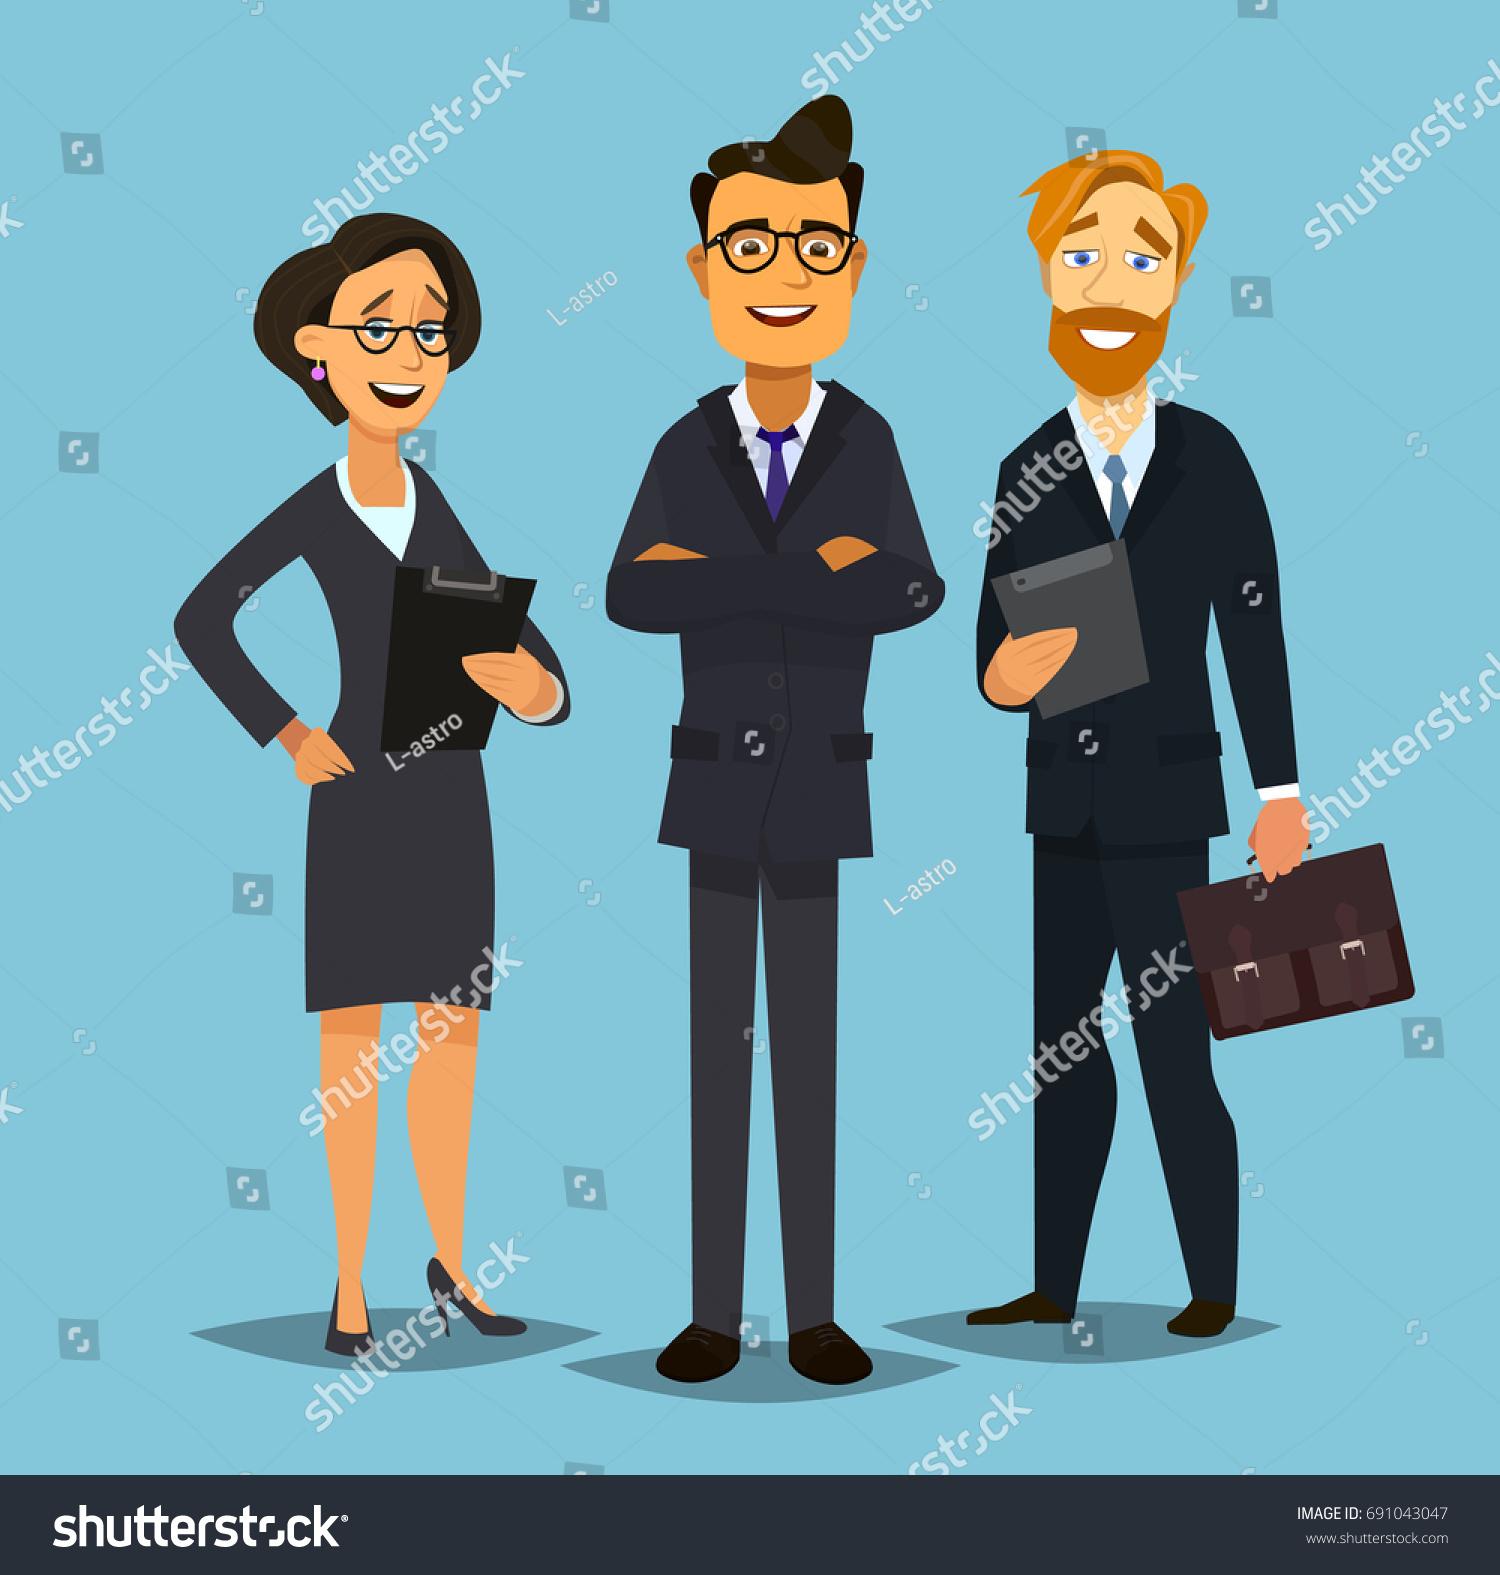 Business team cartoon characters cartoon vector cartoondealer com - Business People Group Standing Team Vector Illustration In Flat Style